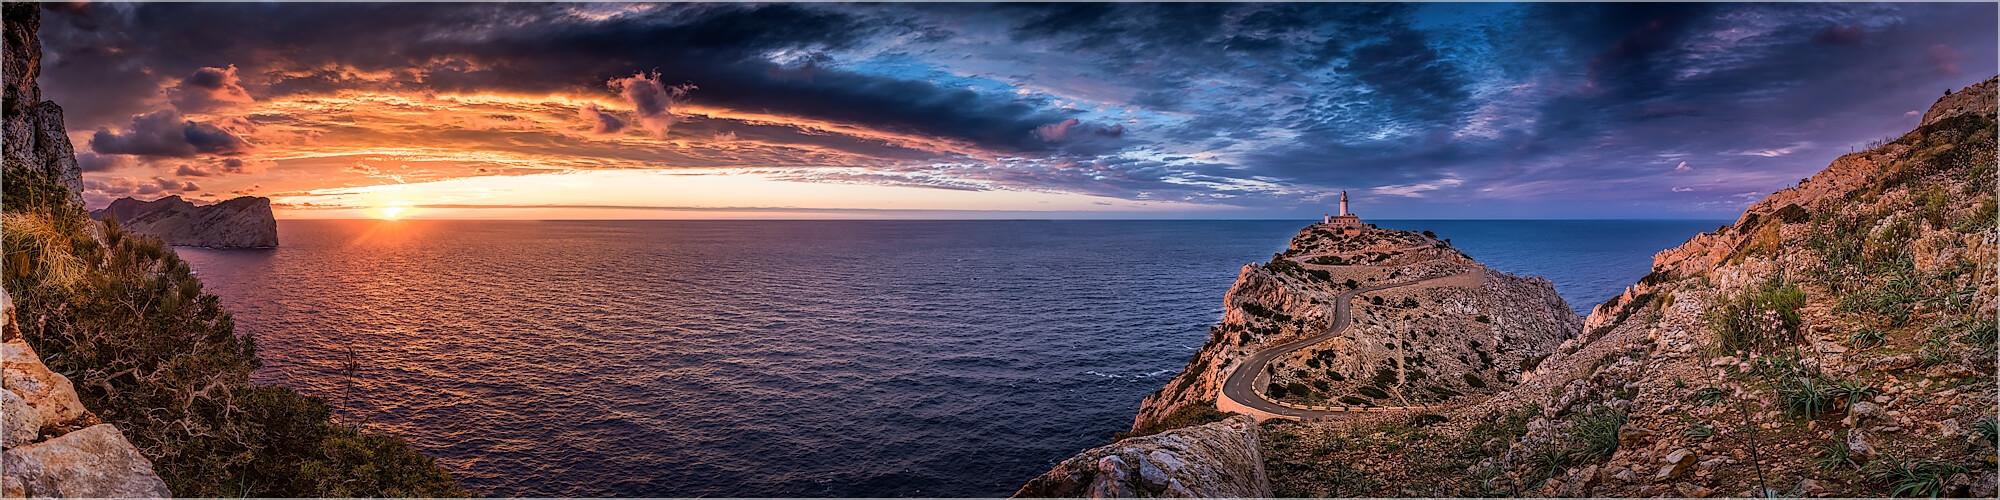 Panoramabild Mallorca Sonnenuntergang Cap Formentor